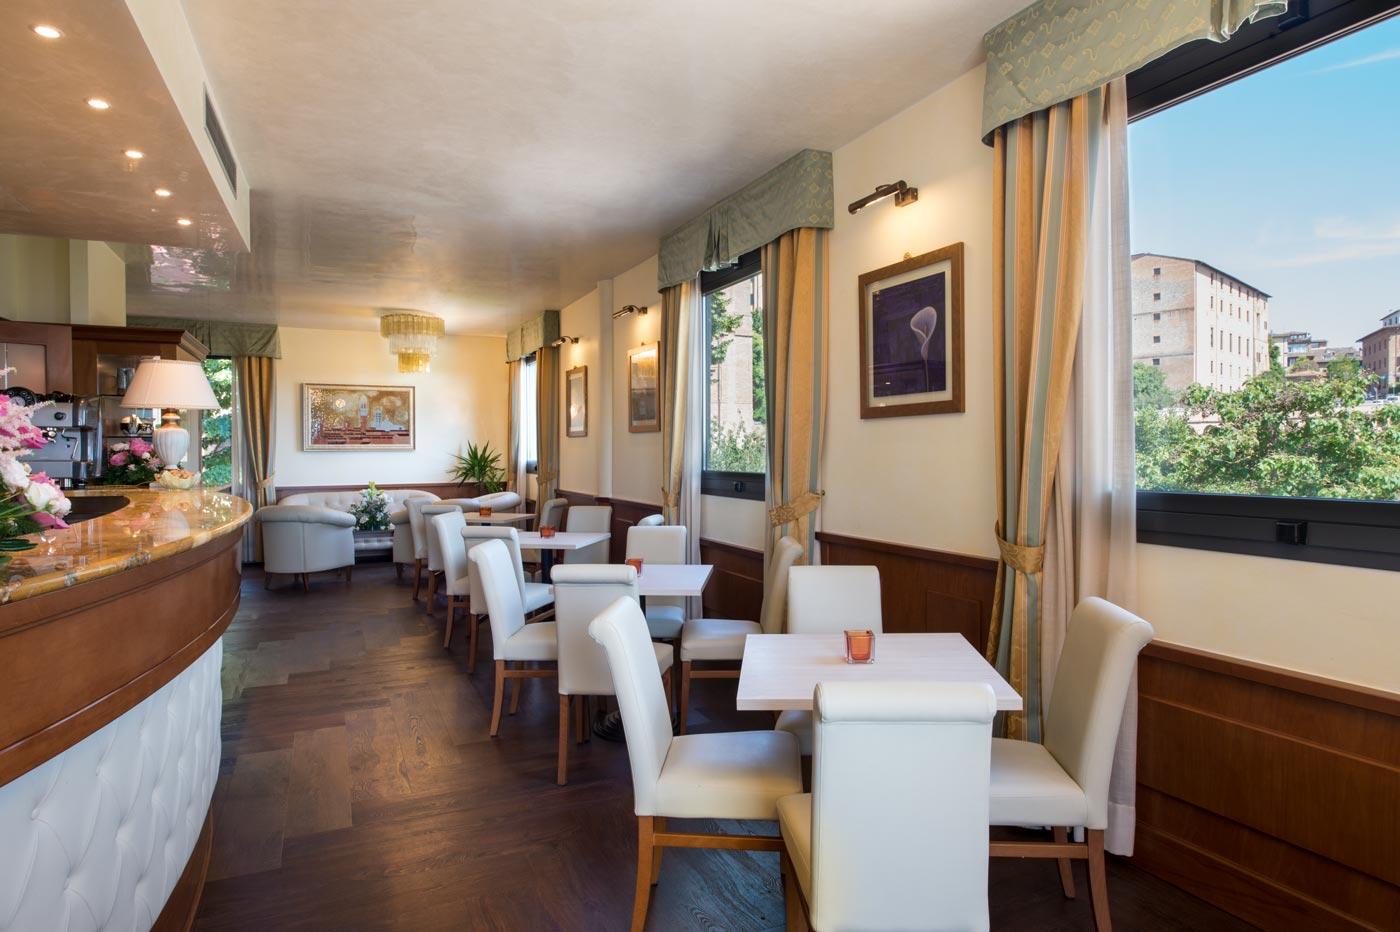 Photo gallery four star hotel in siena hotel athena siena for Accomodation siena